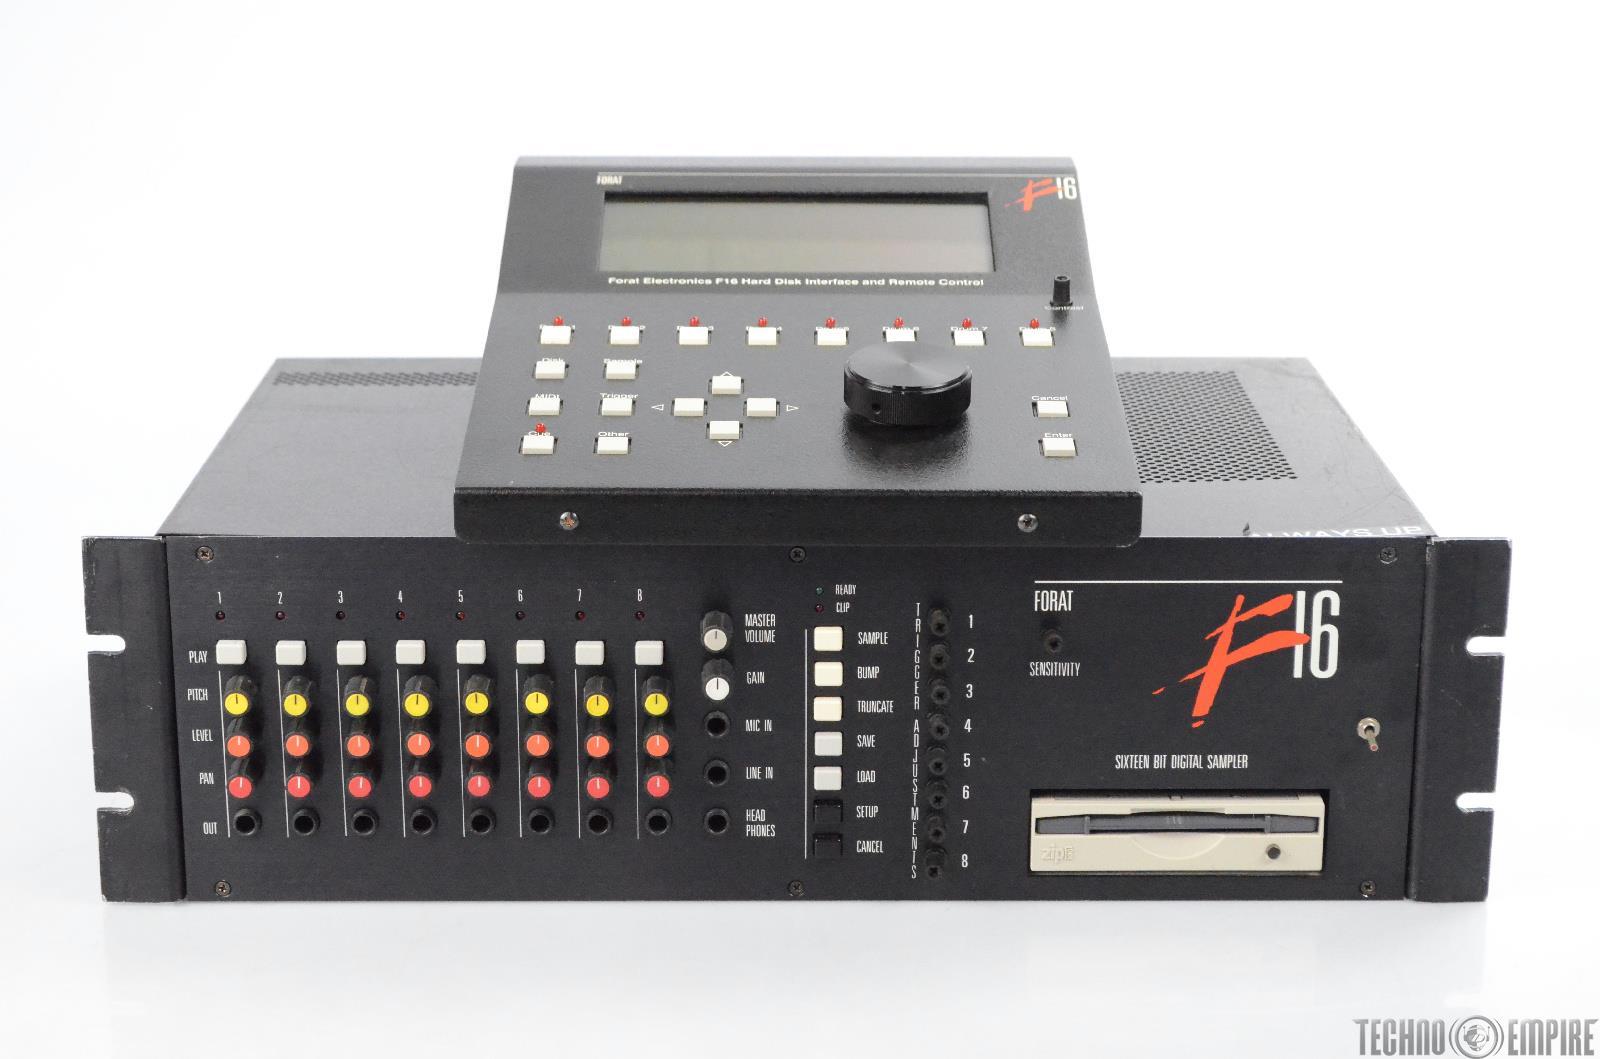 Forat F16 Digital Sampler Electronic Drum Module w/ Remote Control F 16 #30814